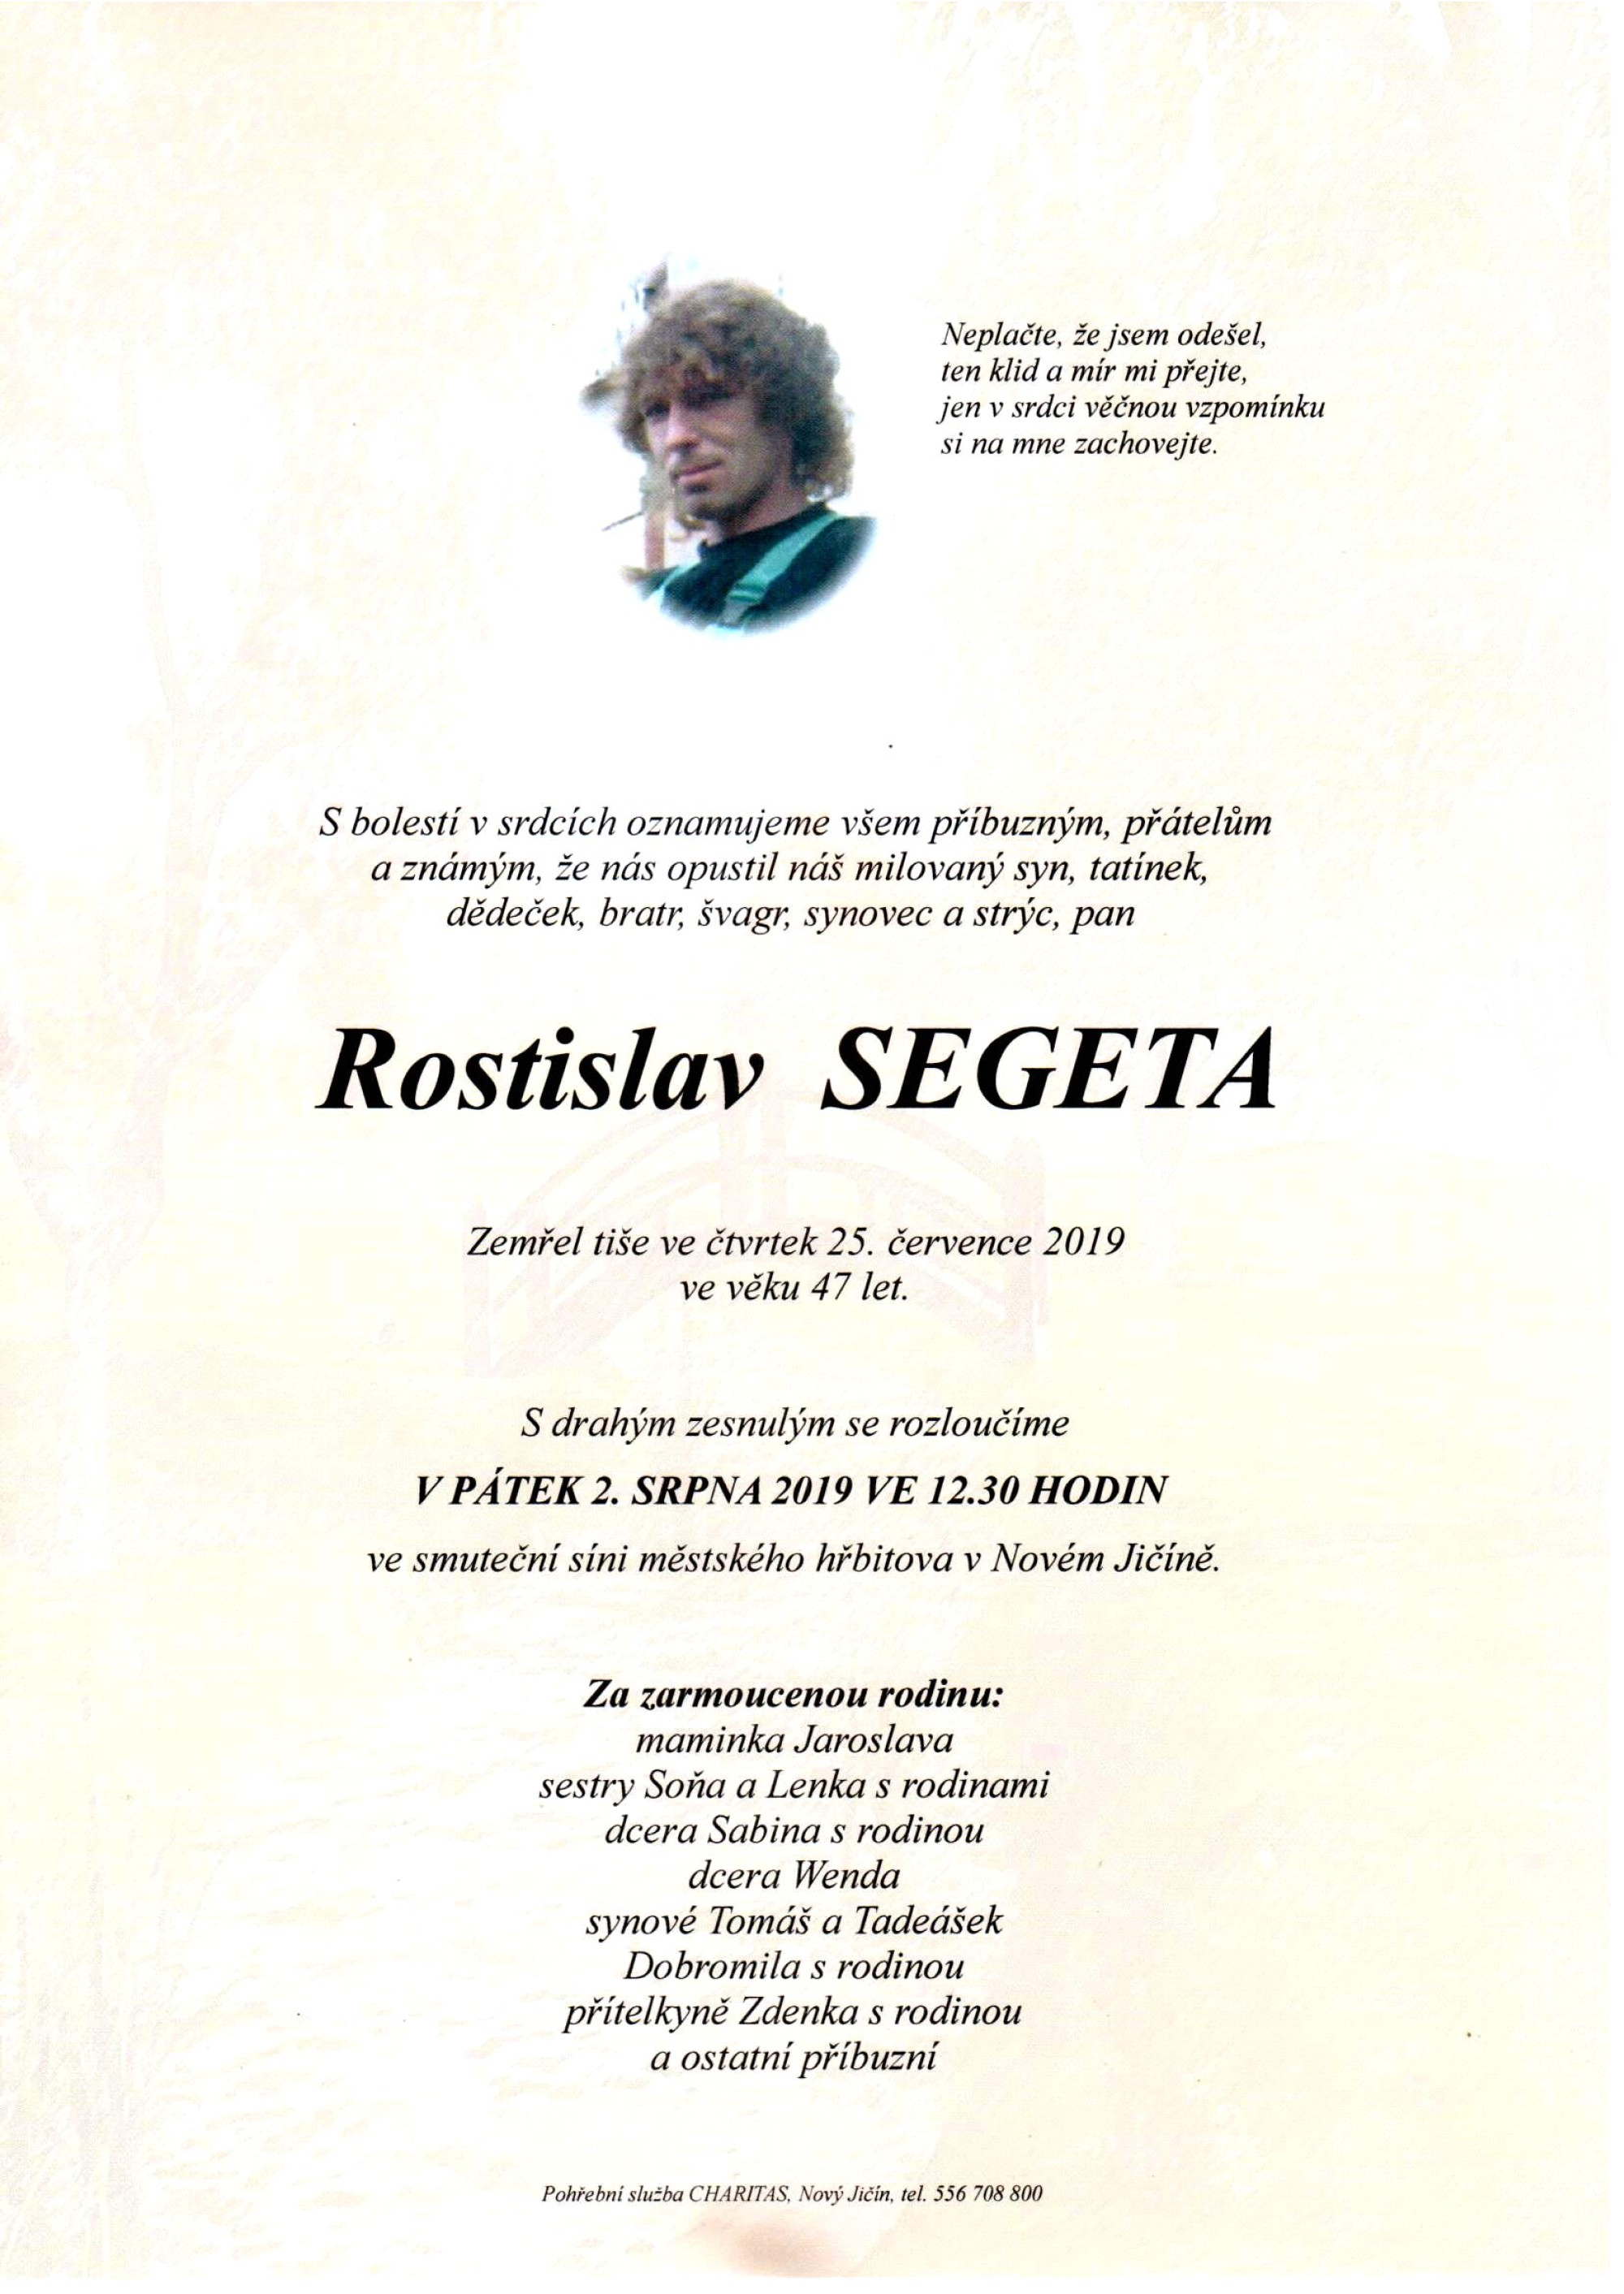 Rostislav Segeta